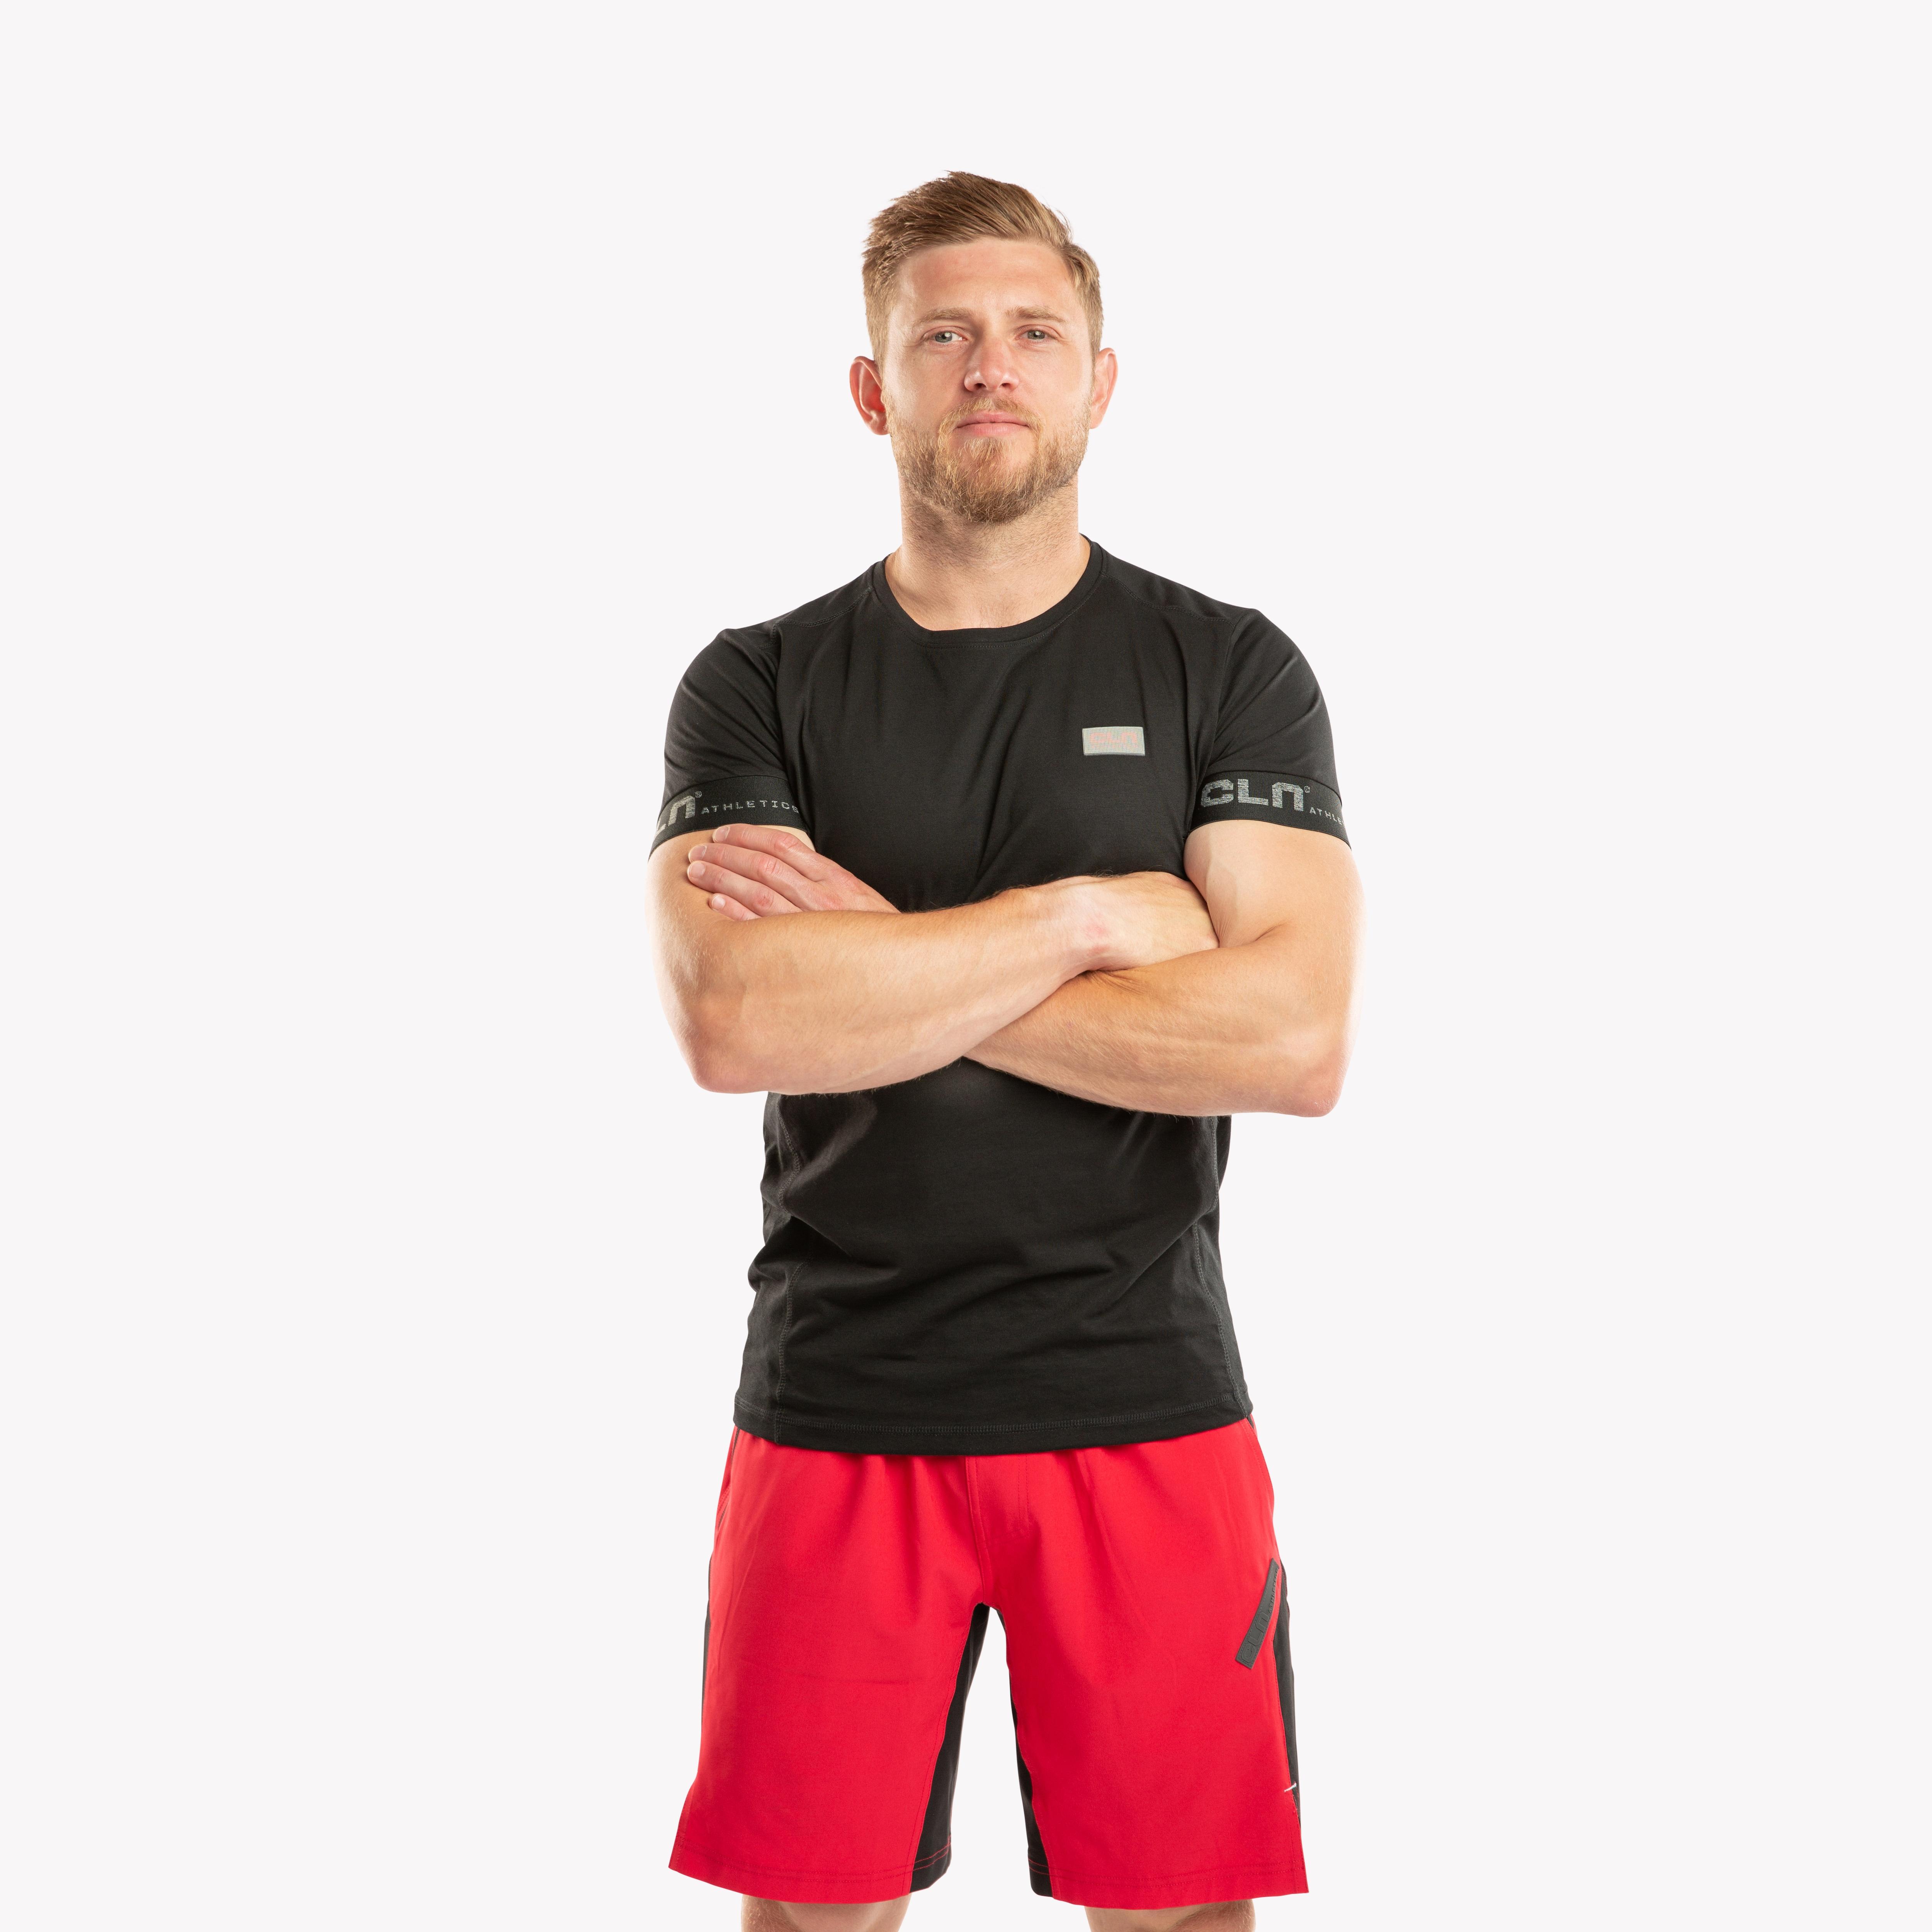 CLN Crustis t-shirt Black